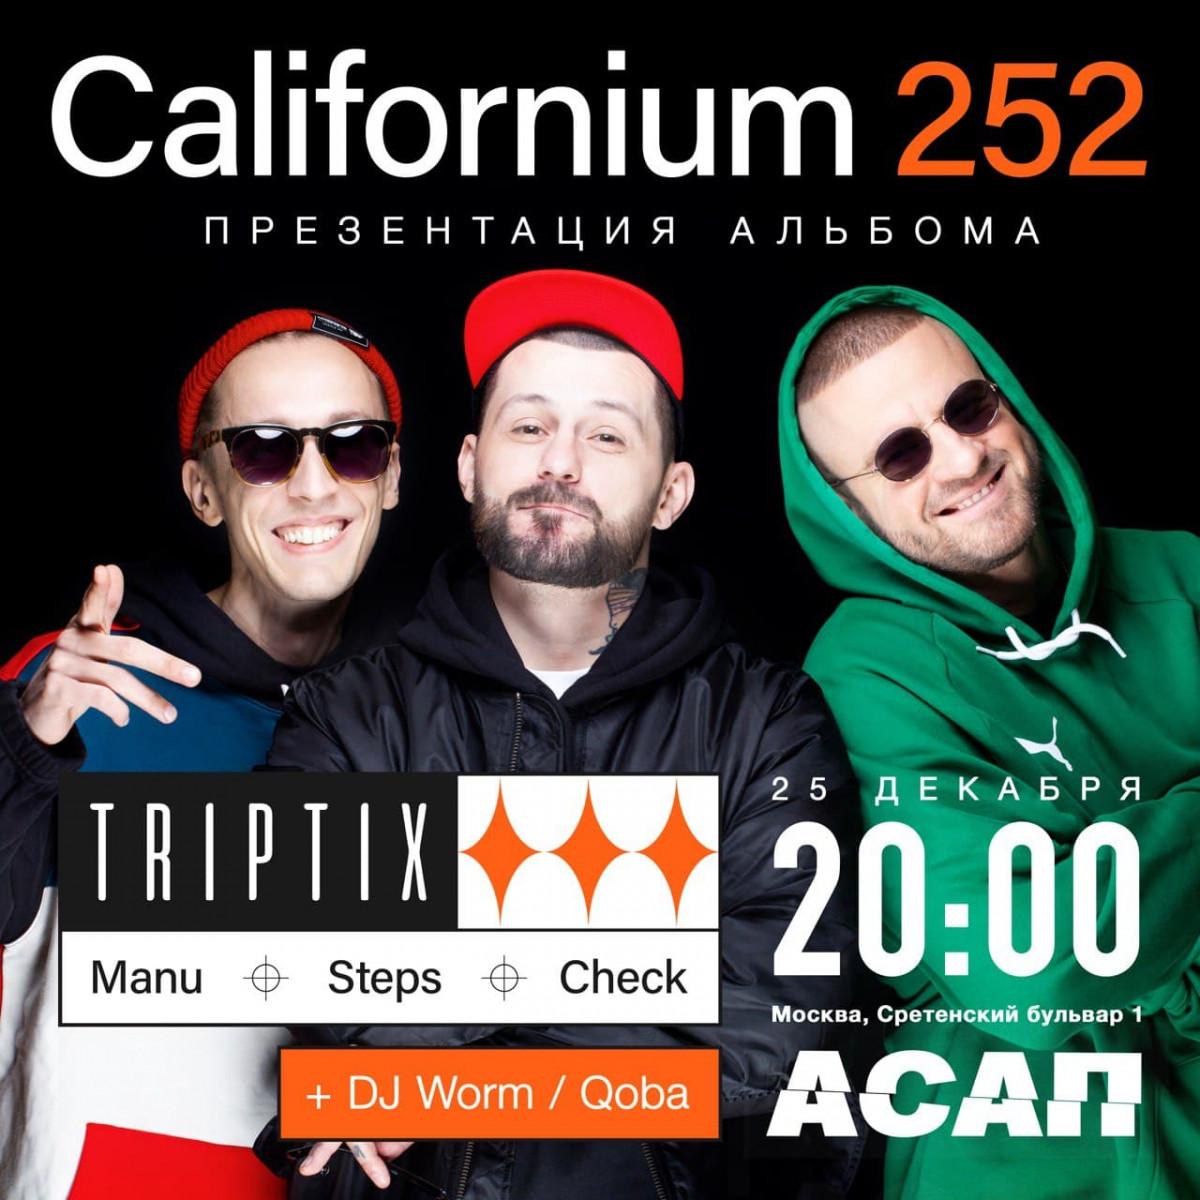 Презентация дебютного альбома группы TRIPTIX (Коля Маню, Steppa Style и T.Check) в Москве